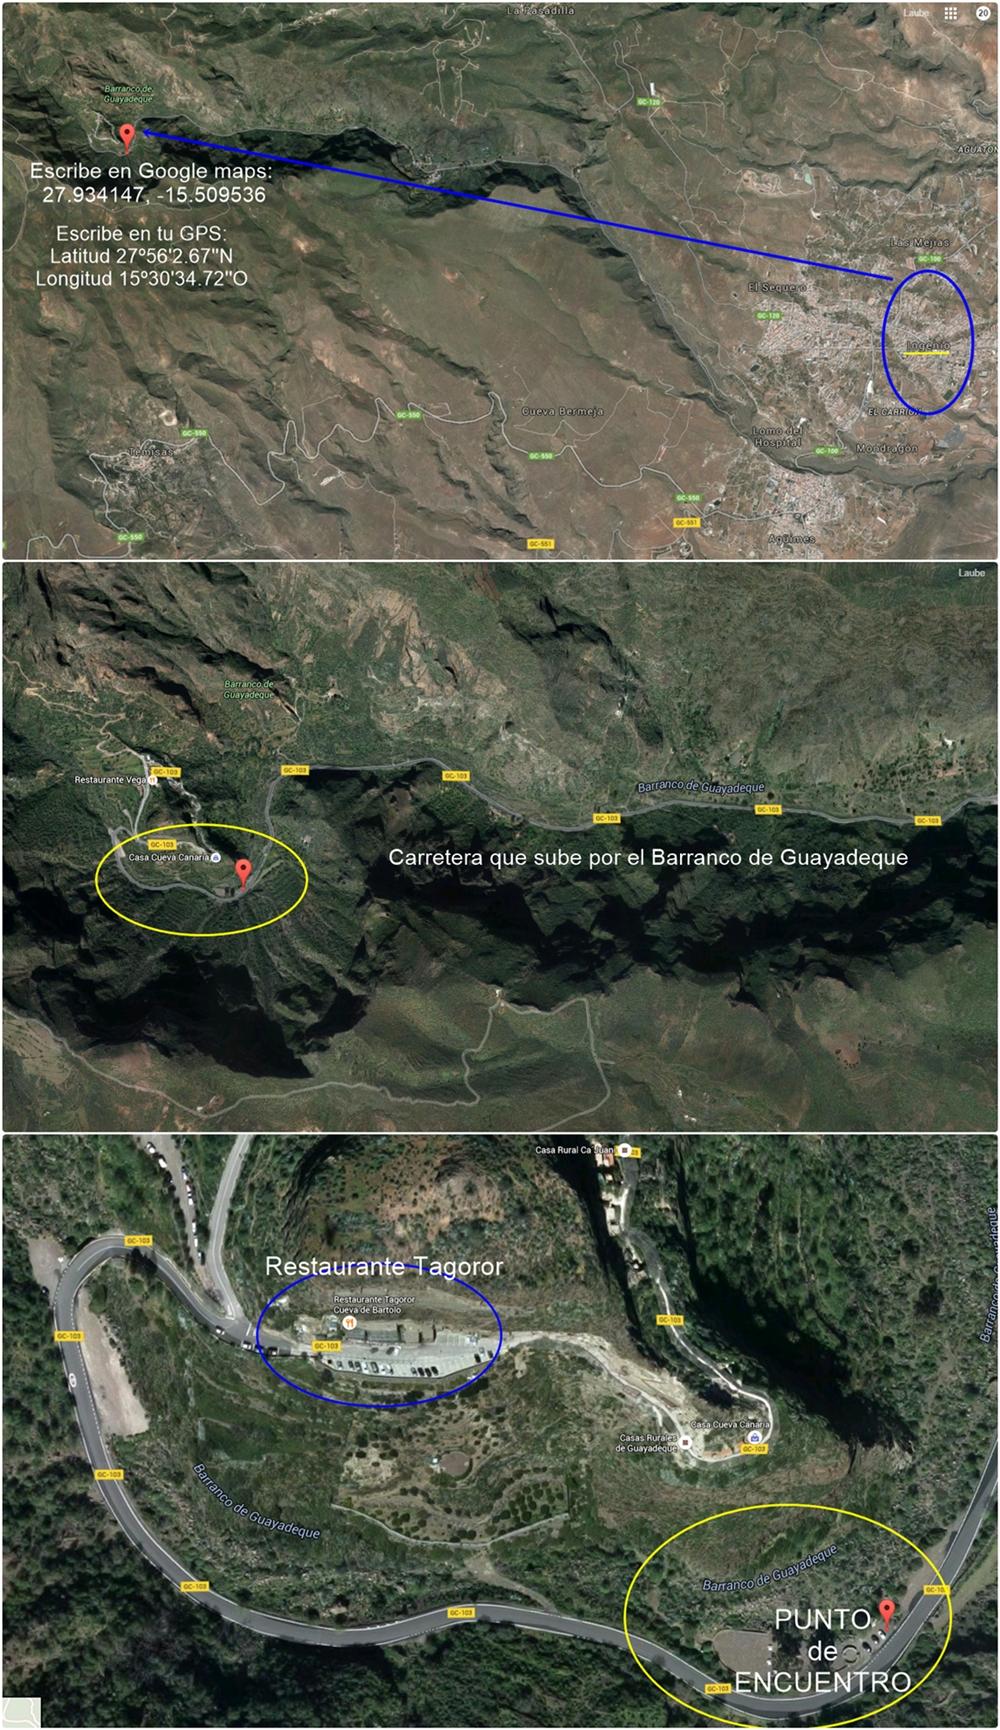 Merendero del Barranco de Guayadeque